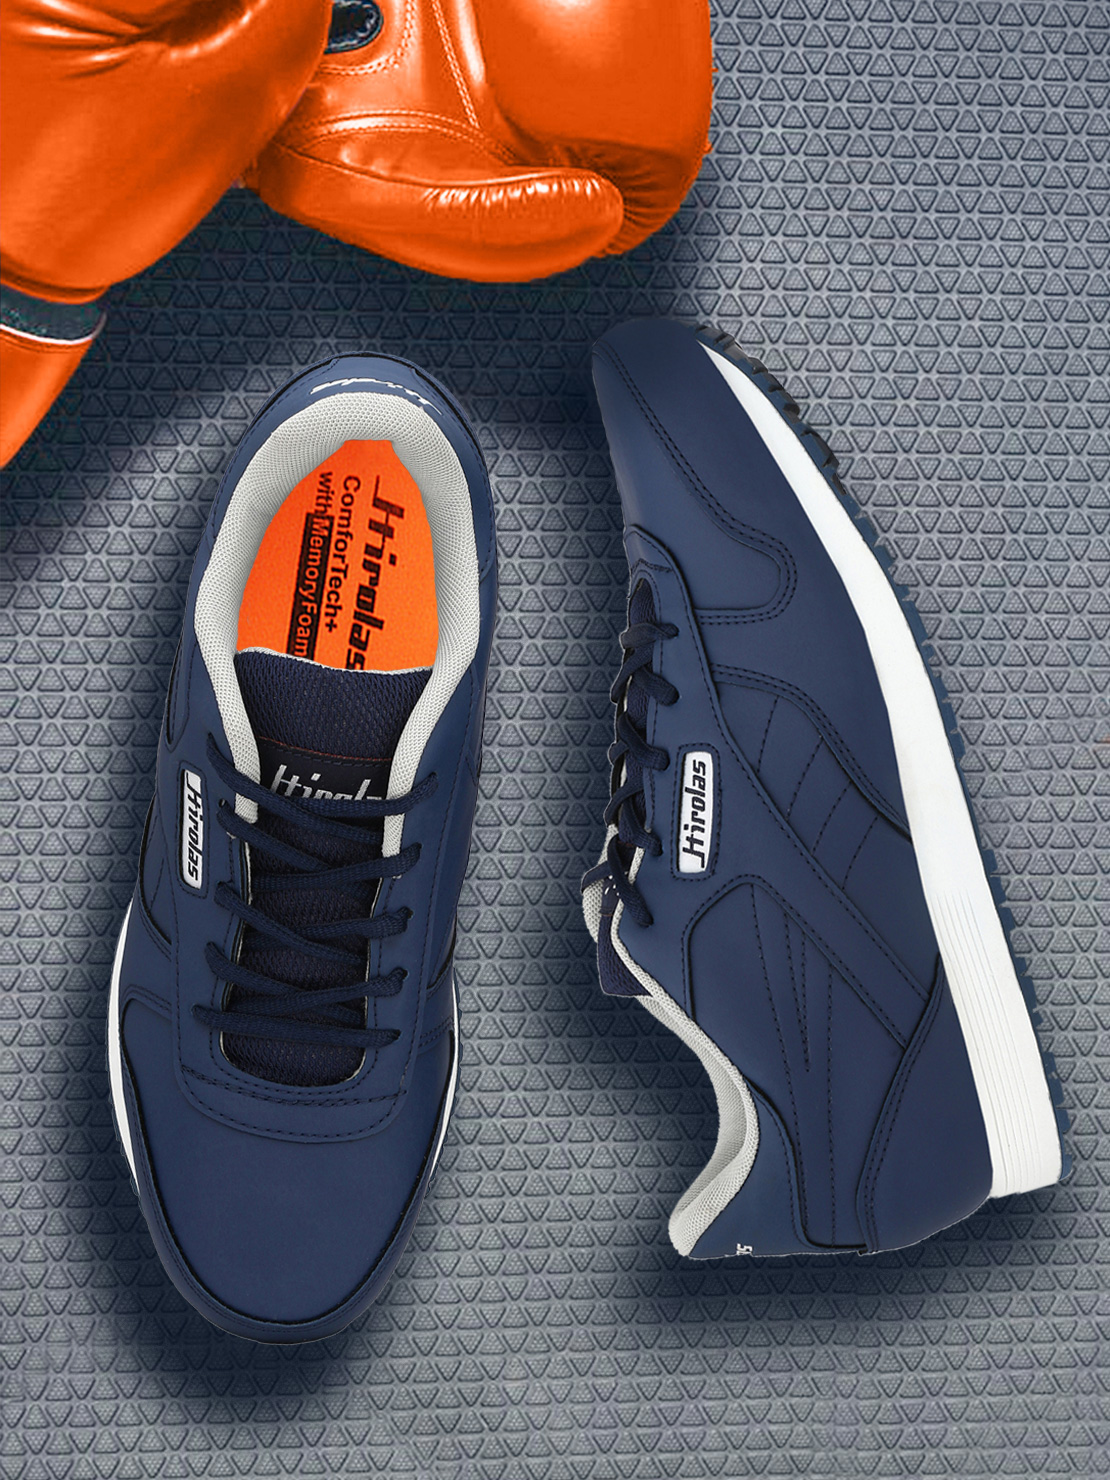 Hirolas   Hirolas Multi Sport Shock Absorbing Walking  Running Fitness Athletic Training Gym Sneaker Shoes - Blue